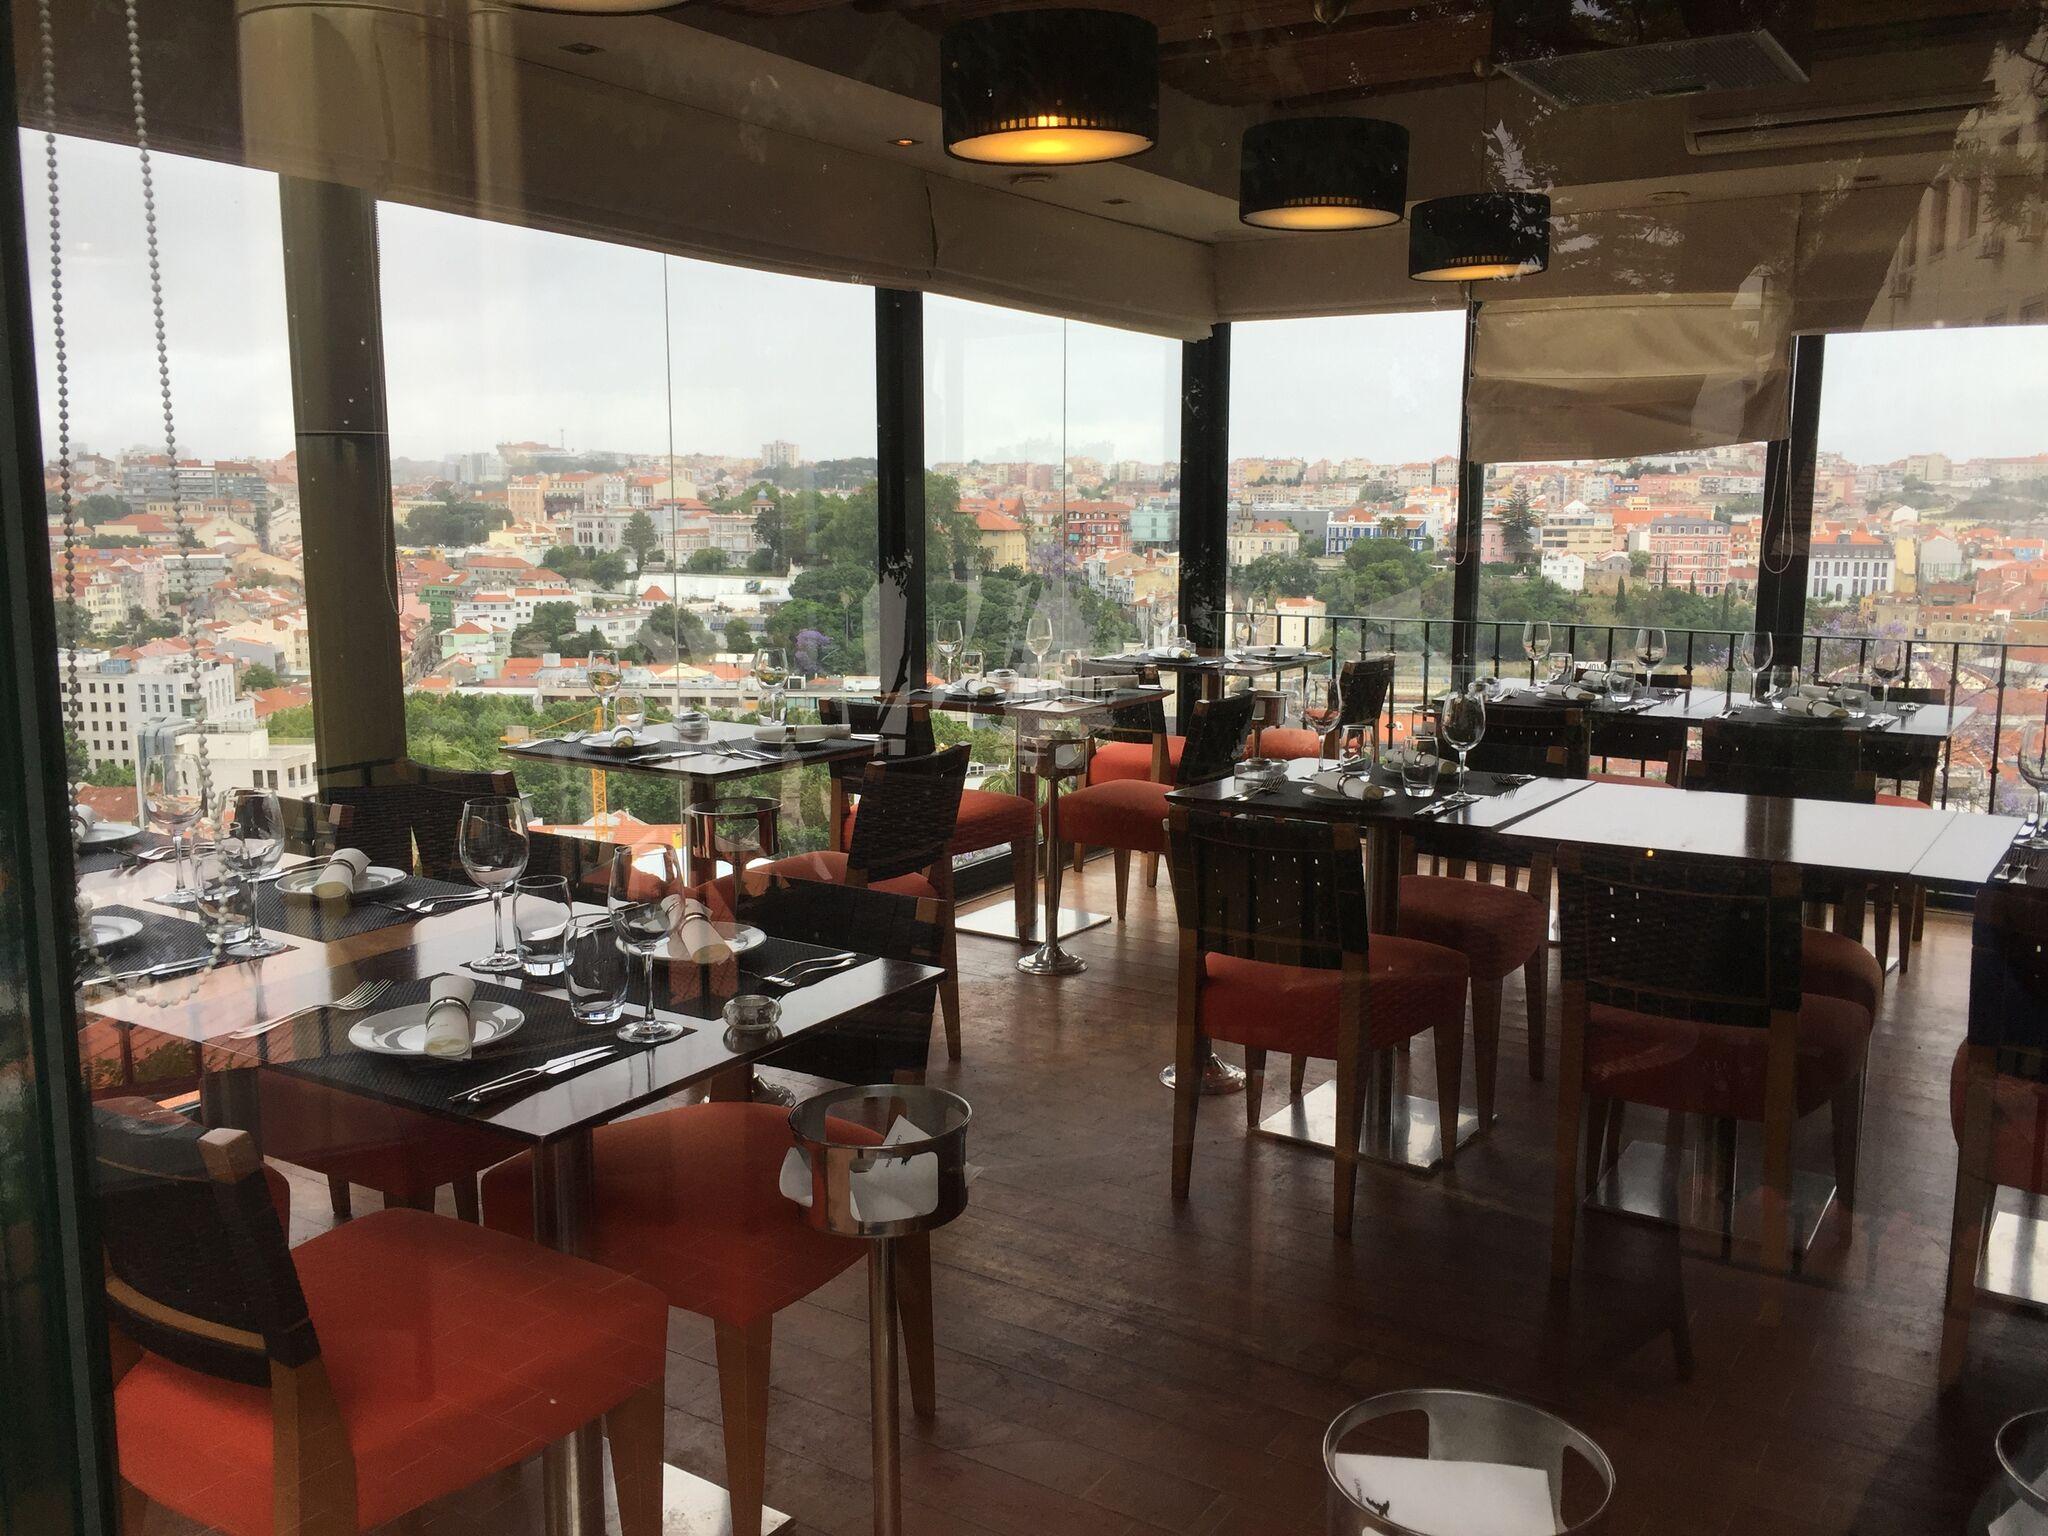 la papa rucha 1024x768 - 10+ Best Rooftop Bars To Catch Lisbon's Mesmerizing Sunsets